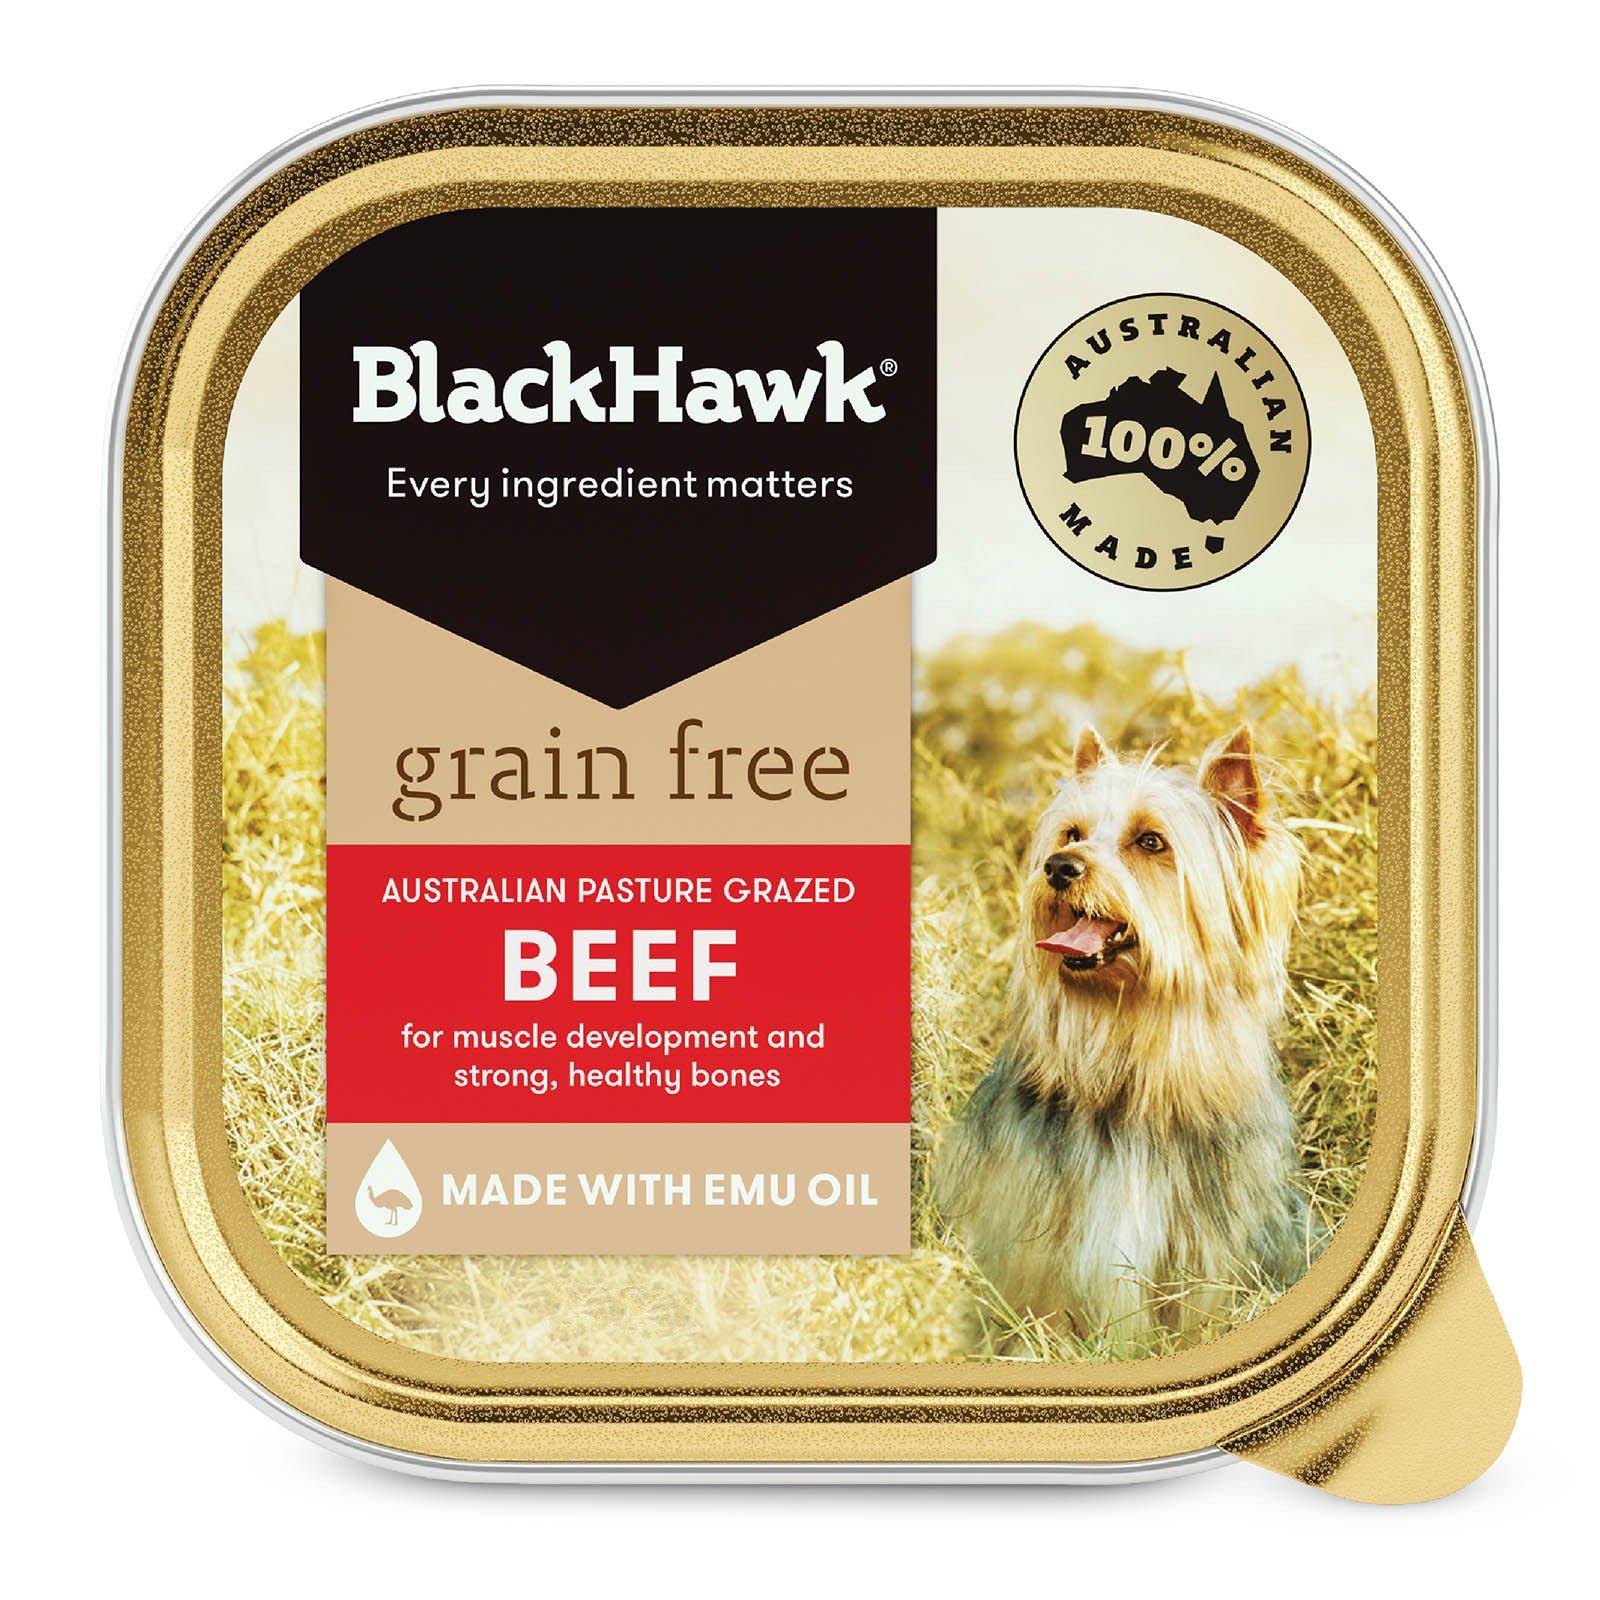 Black Hawk Grain Free Beef Canned Wet Dog Food  100 gm